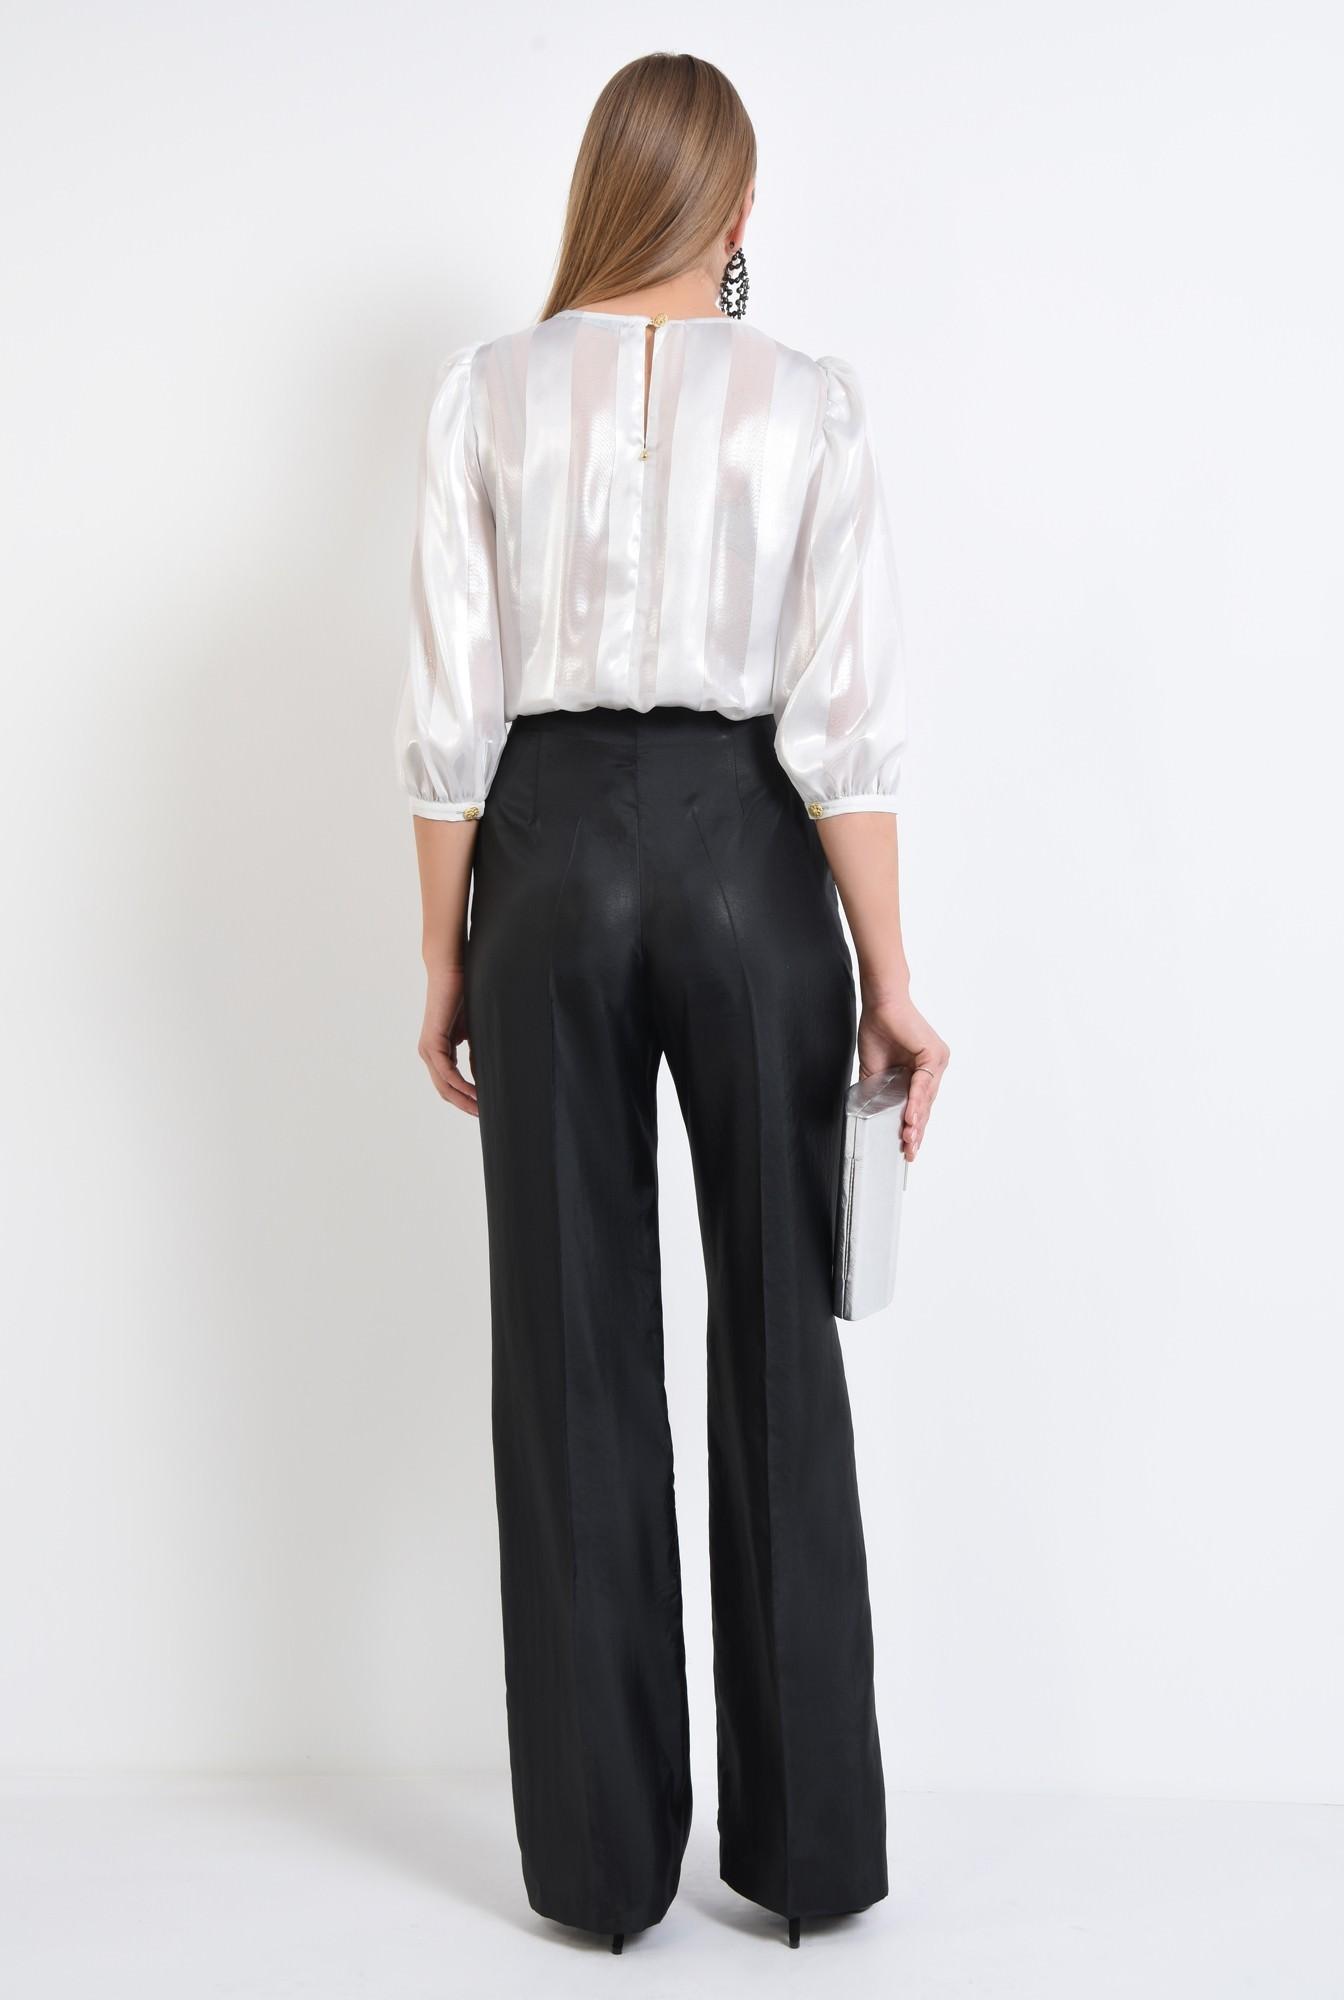 1 - 360 - bluza eleganta argintie, sifon, dungi, pliseuri la decolteu